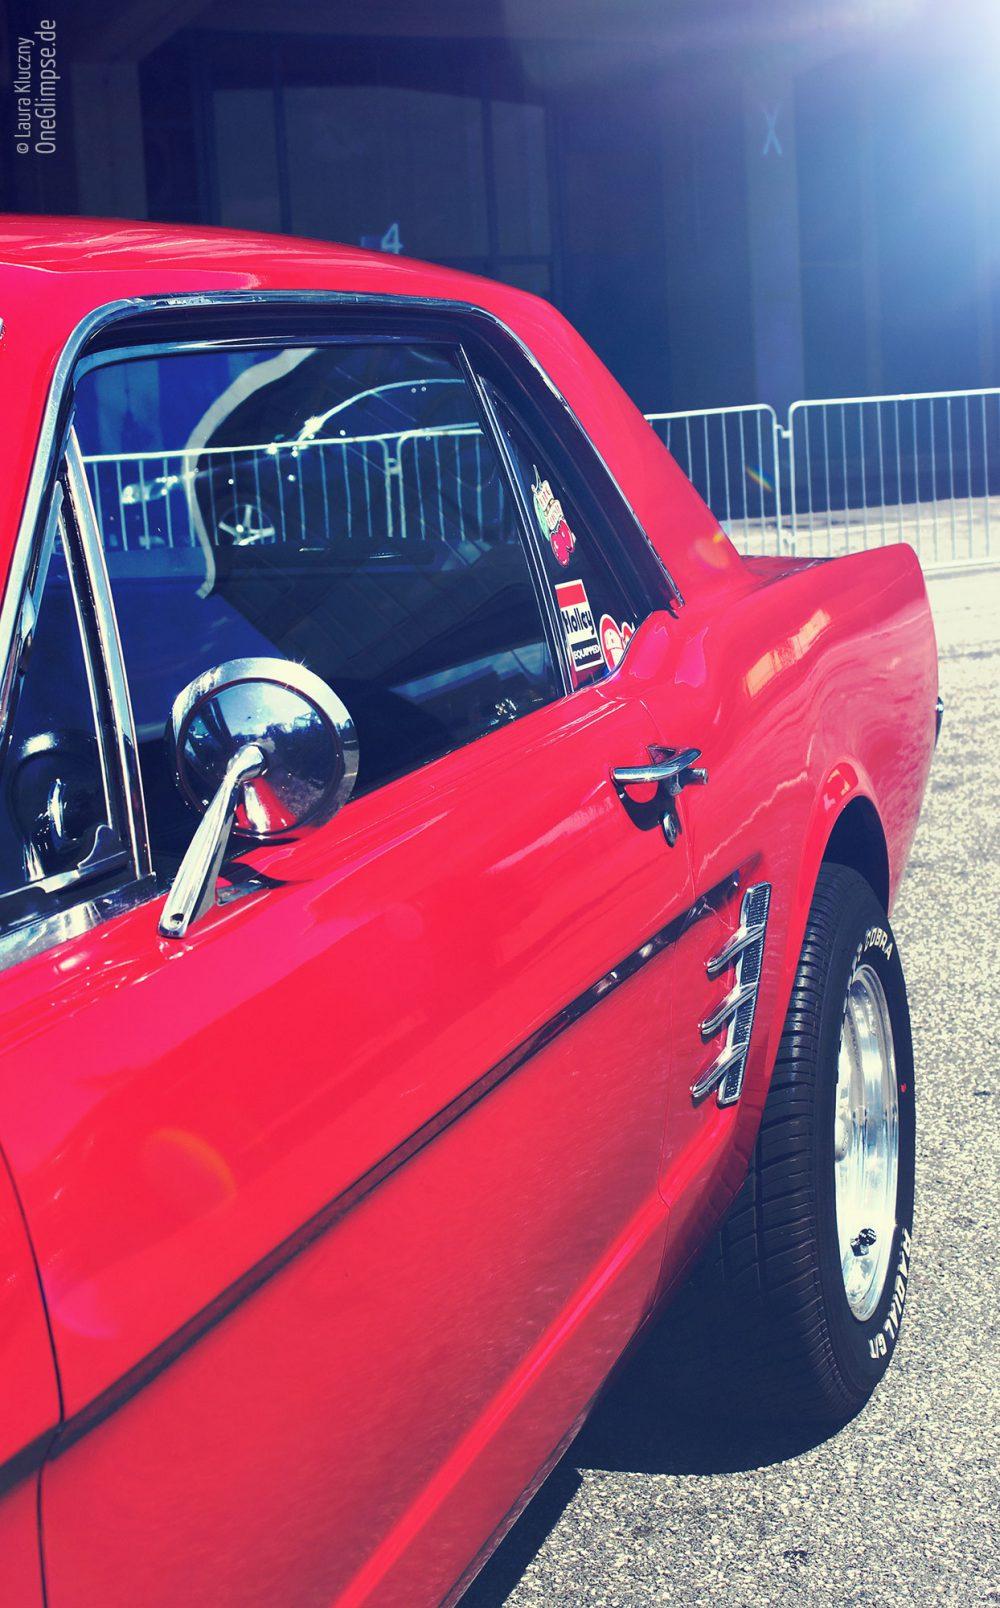 Ford Mustang rot Chrom Street Mag Show 2018 Hamburg